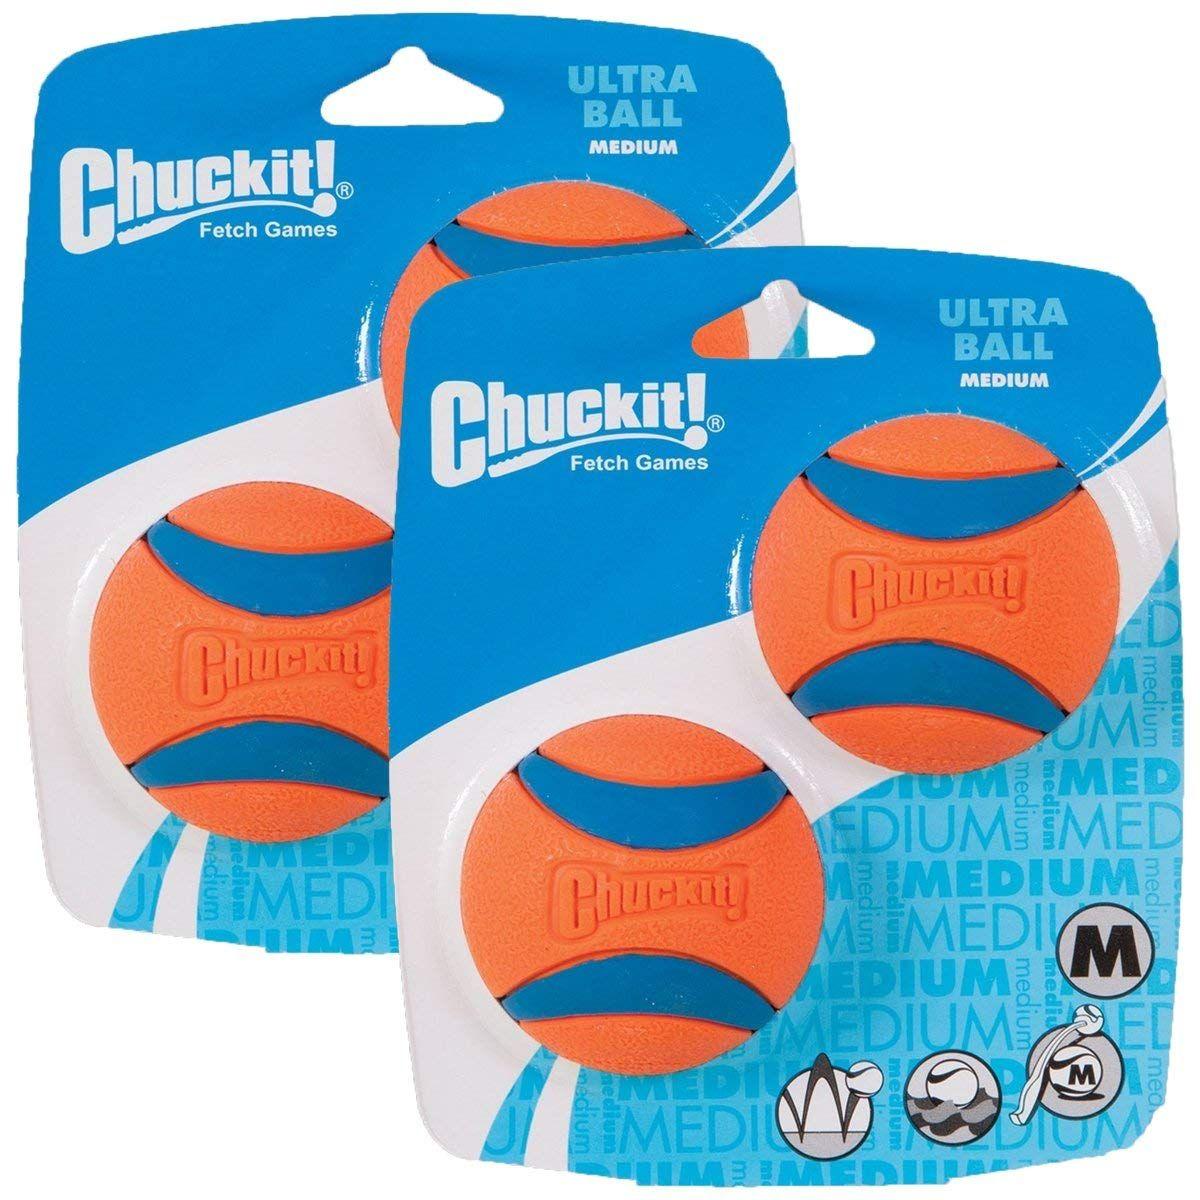 Canine Hardware Chuckit Ultra Ball Medium 2 5 Inch 4 Pack